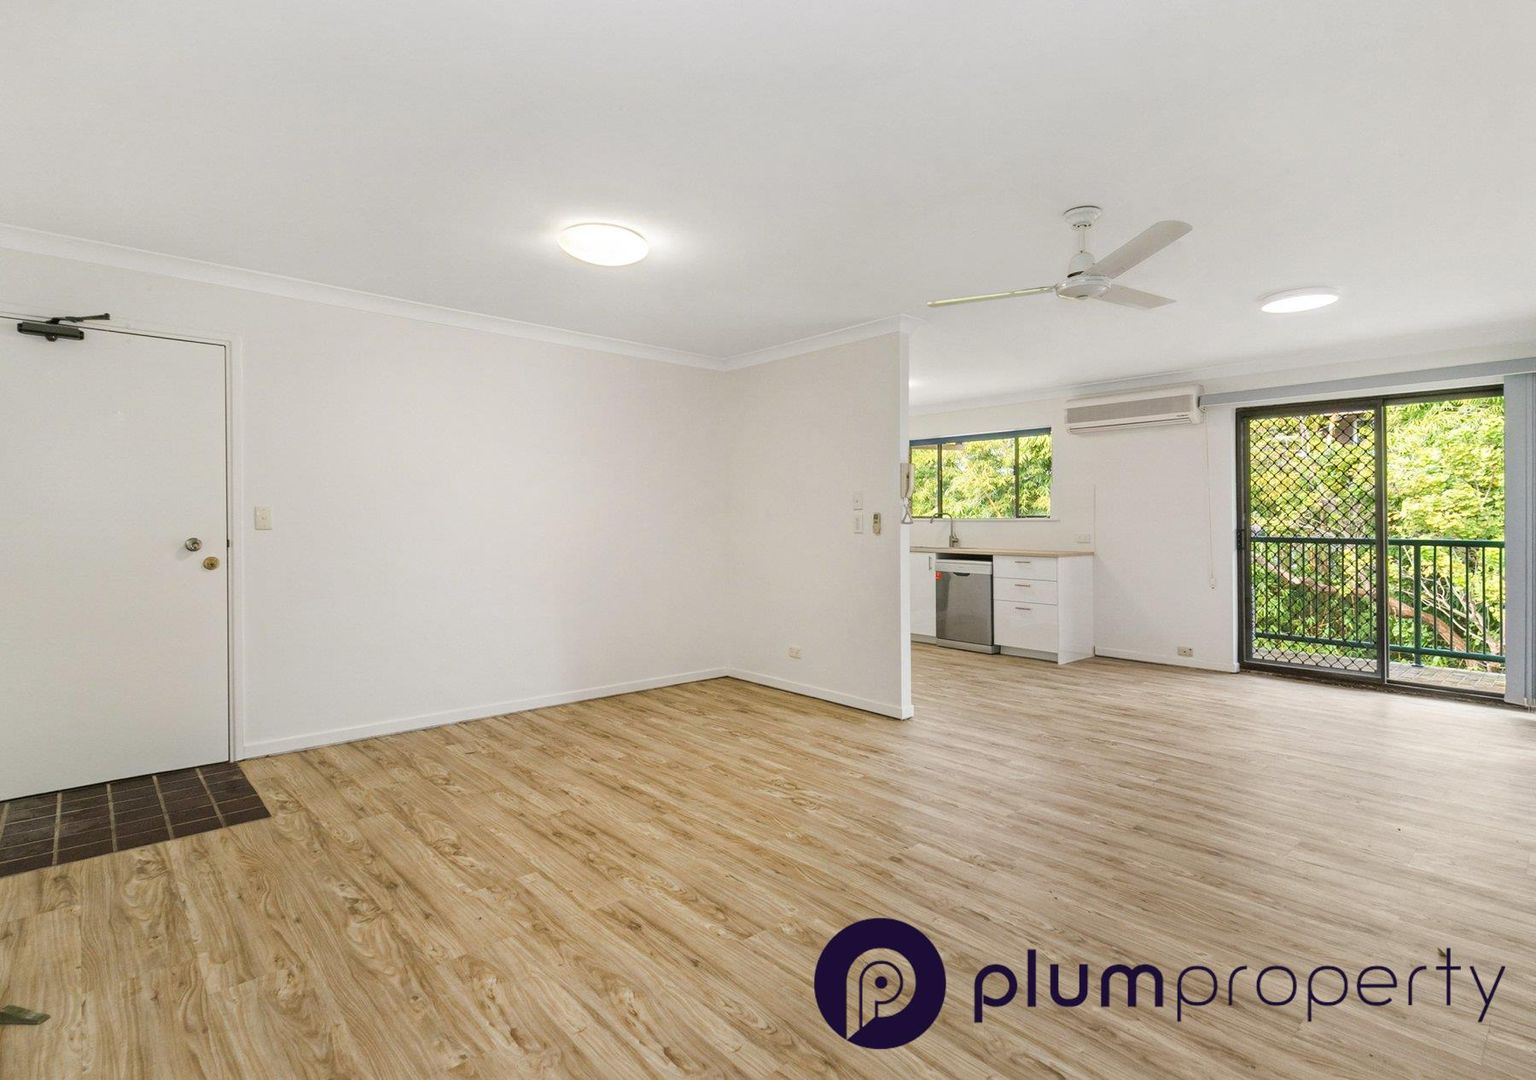 2 bedrooms Apartment / Unit / Flat in 10/35 Durham Street ST LUCIA QLD, 4067